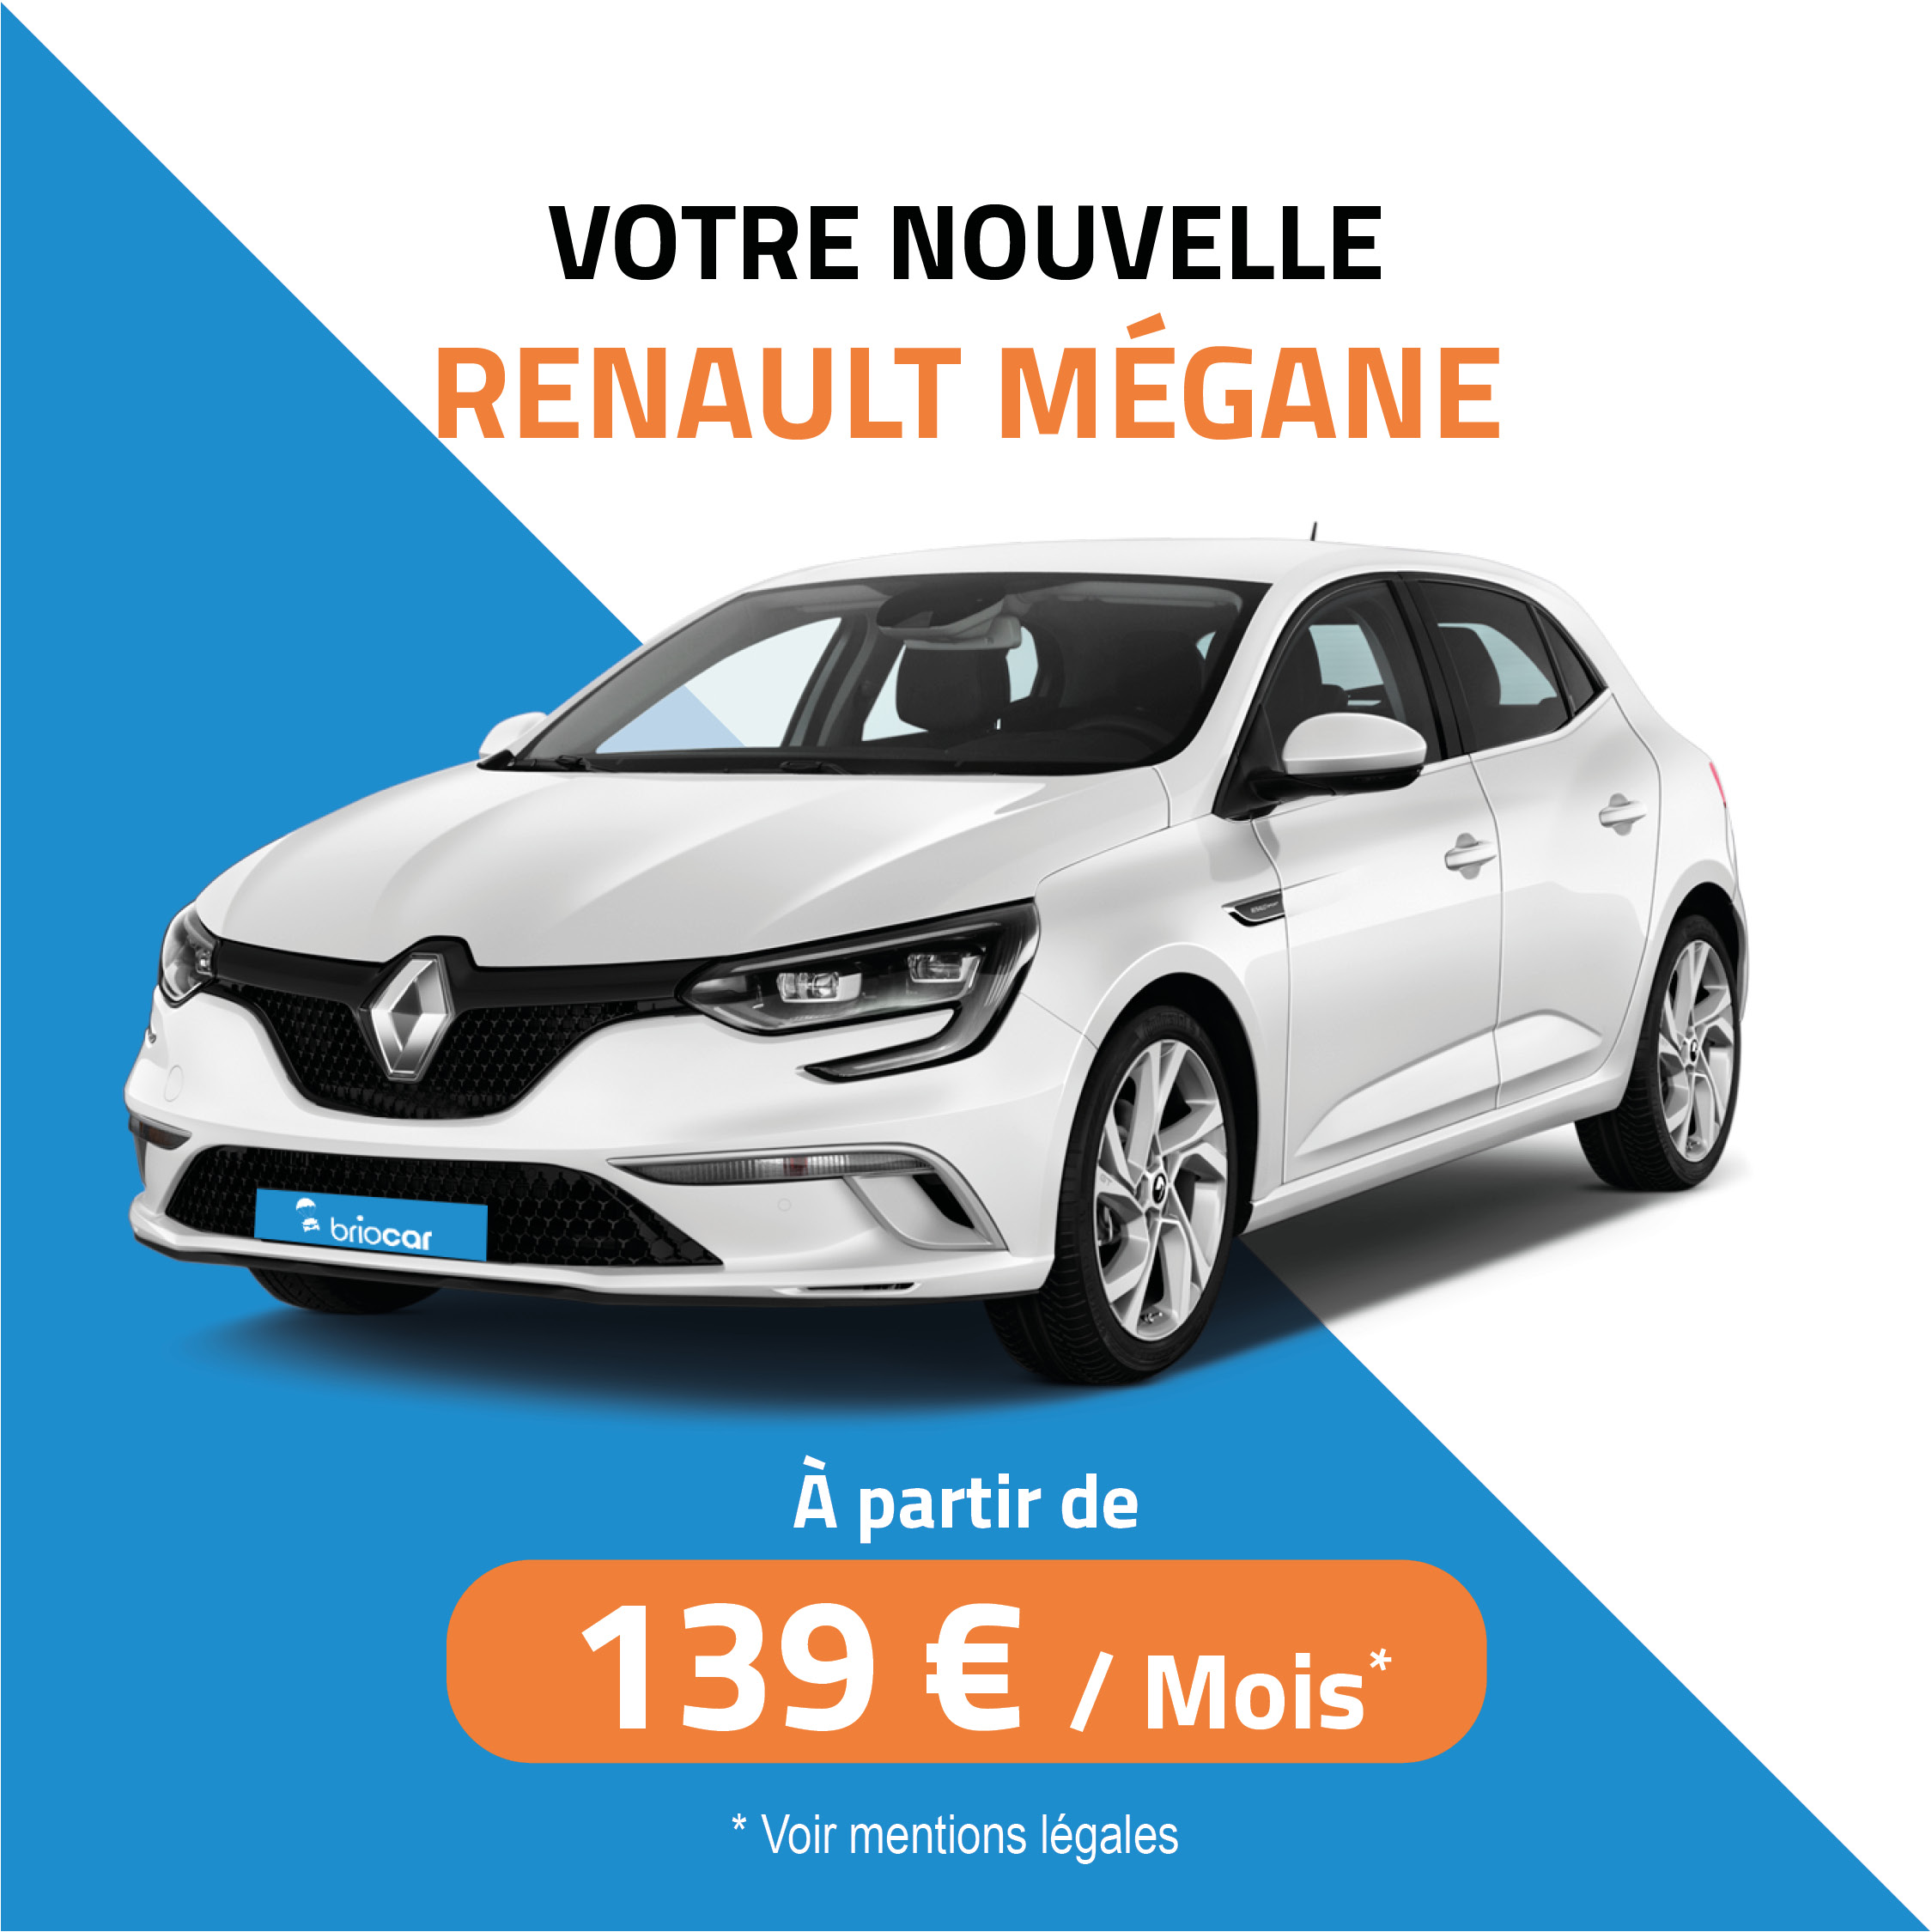 Renault Mégane LOA